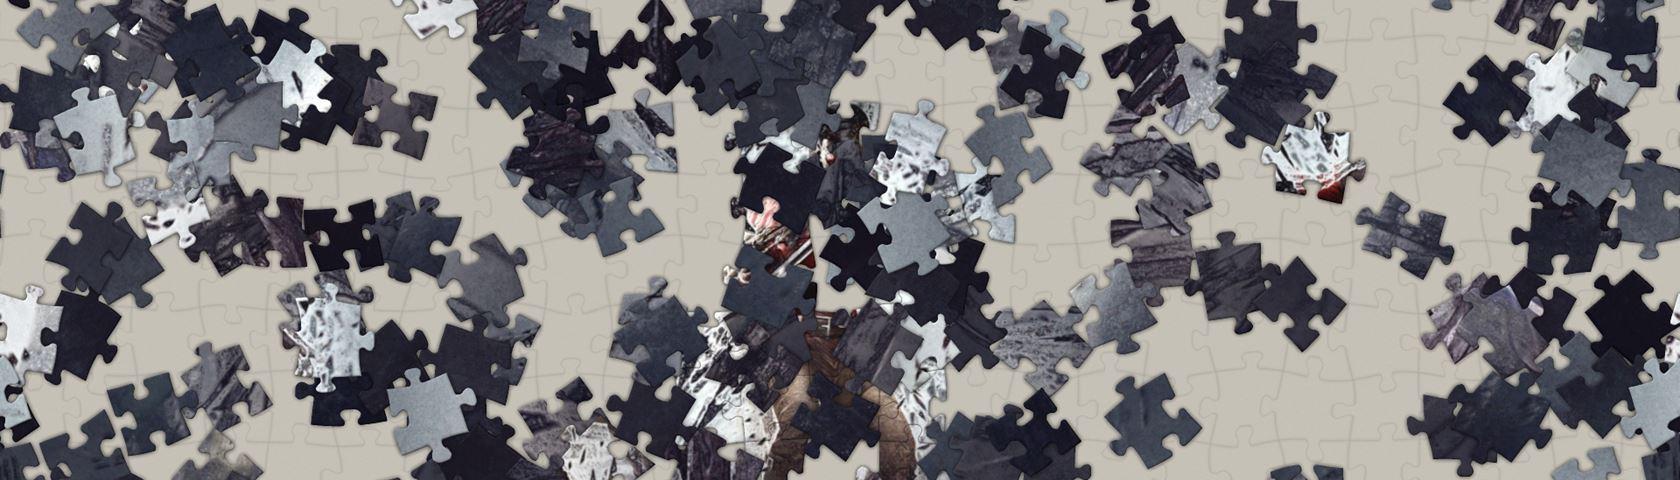 Jigsaw #2